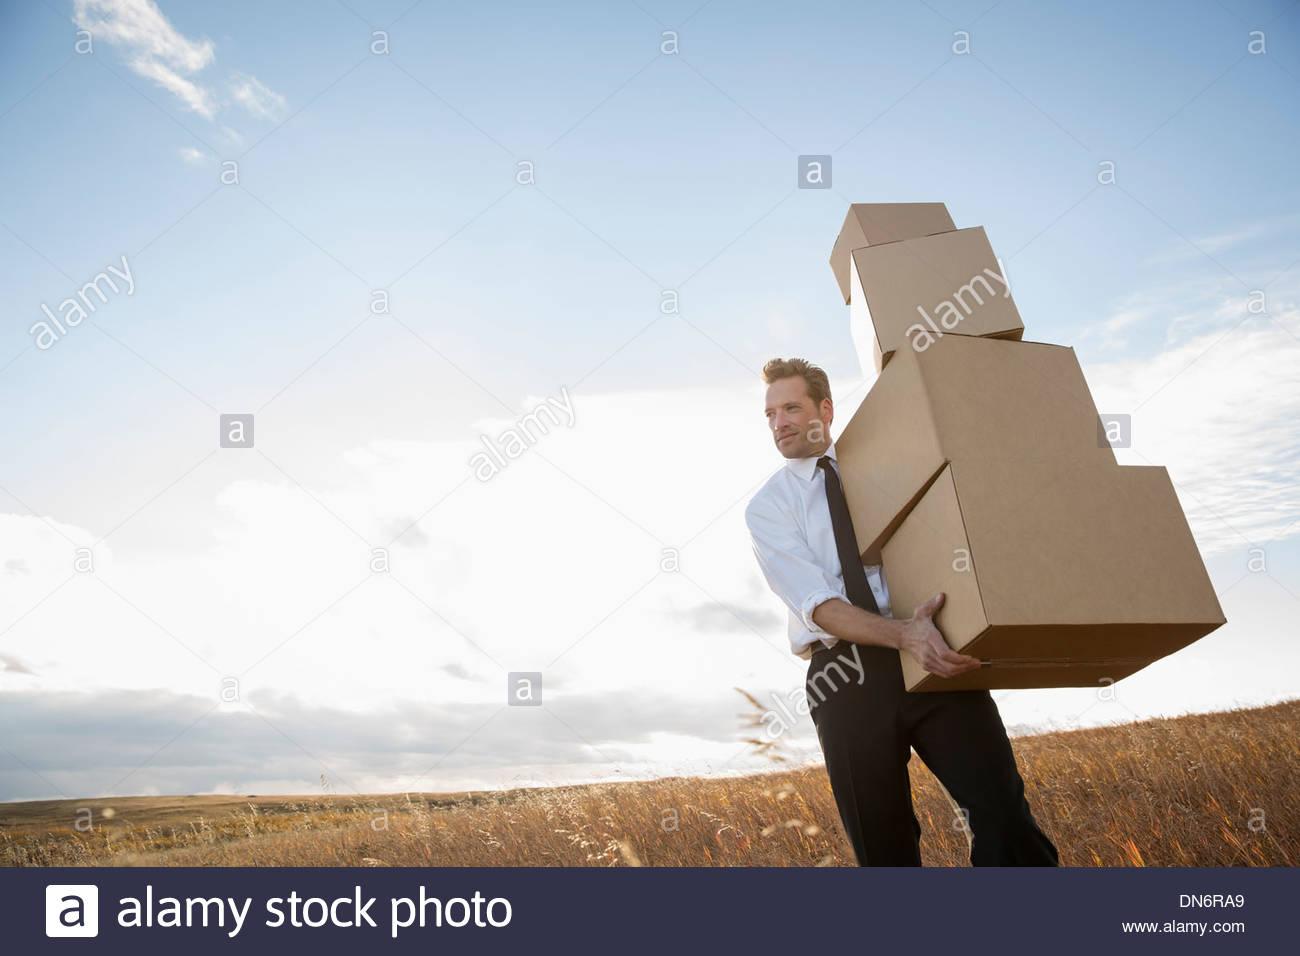 Geschäftsmann mit gestapelten Kartons Stockbild